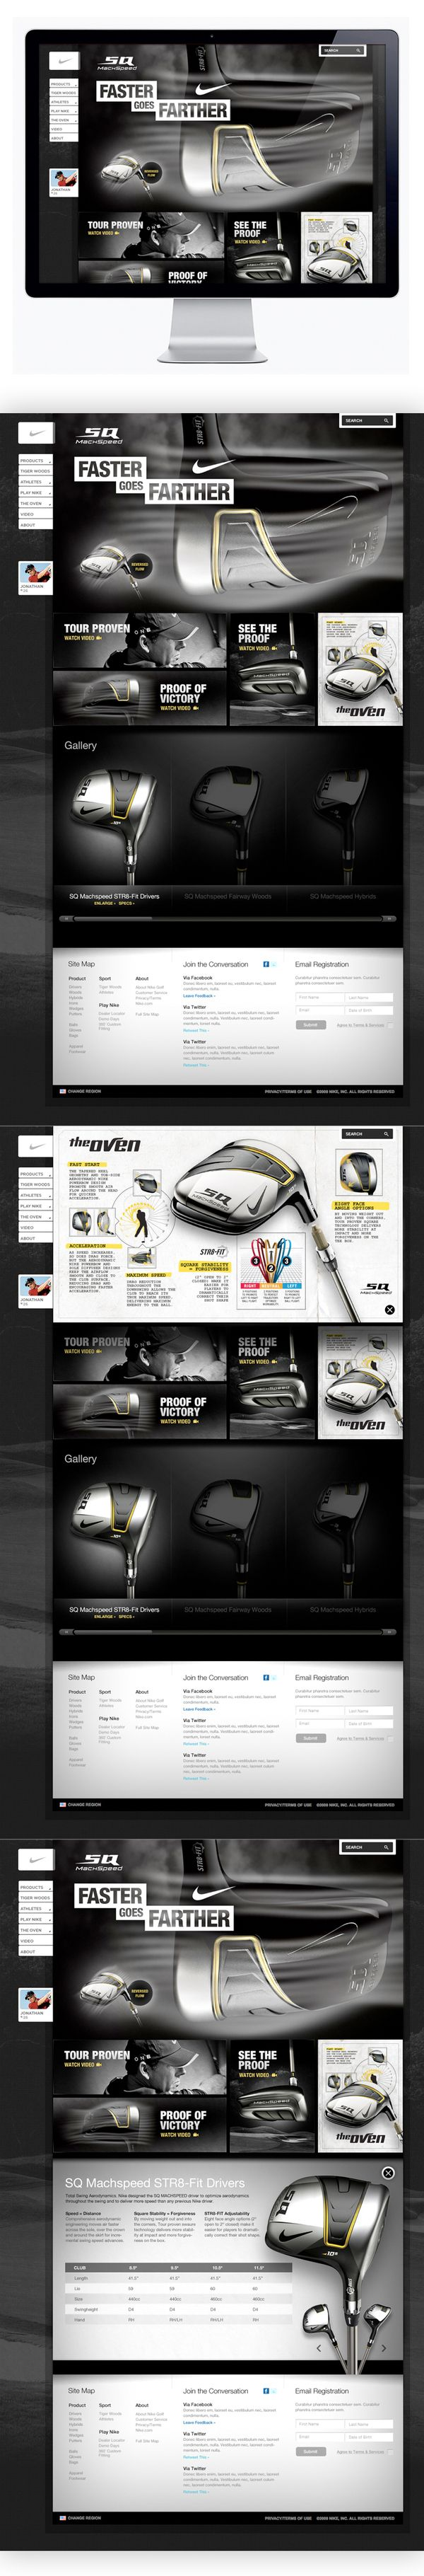 Nike Golf - Machspeed| #webdesign #it #web #design #layout #userinterface #website #webdesign <<< repinned by an #advertising #agency from #Hamburg / #Germany - www.BlickeDeeler.de